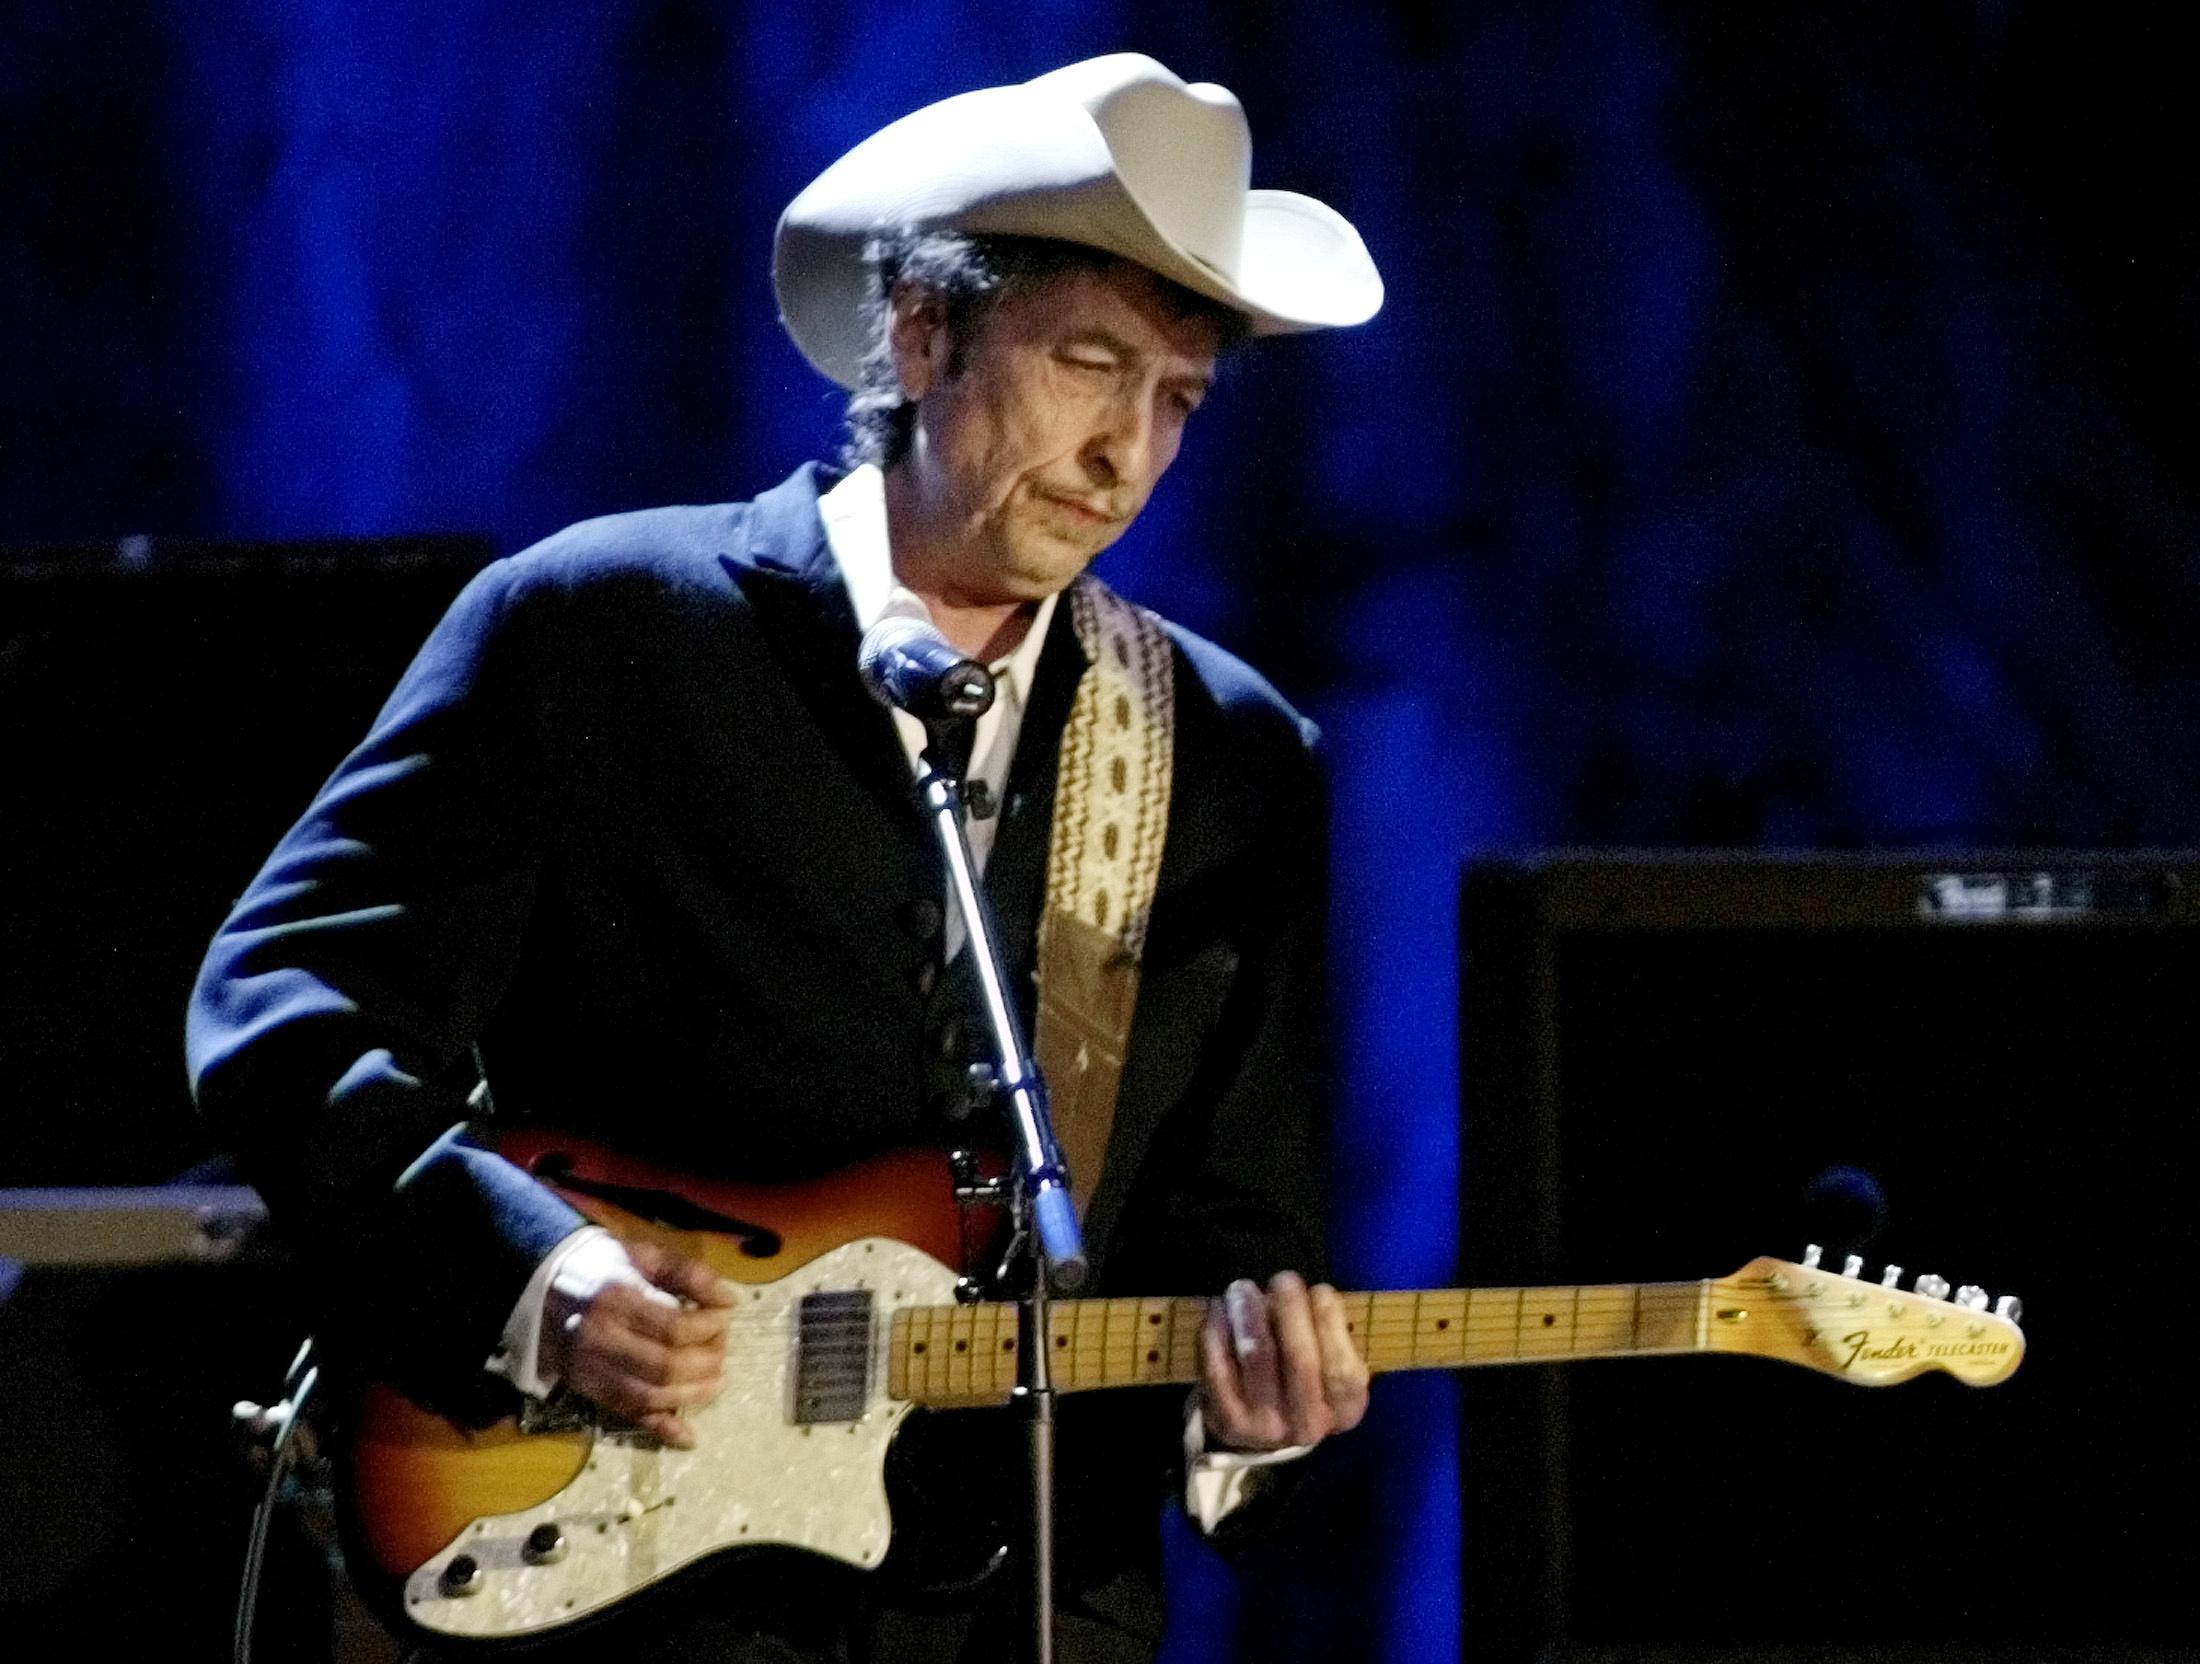 Review: Bob Dylan's 'Triplicate' Exudes, Celebrates a Majestic Darkness